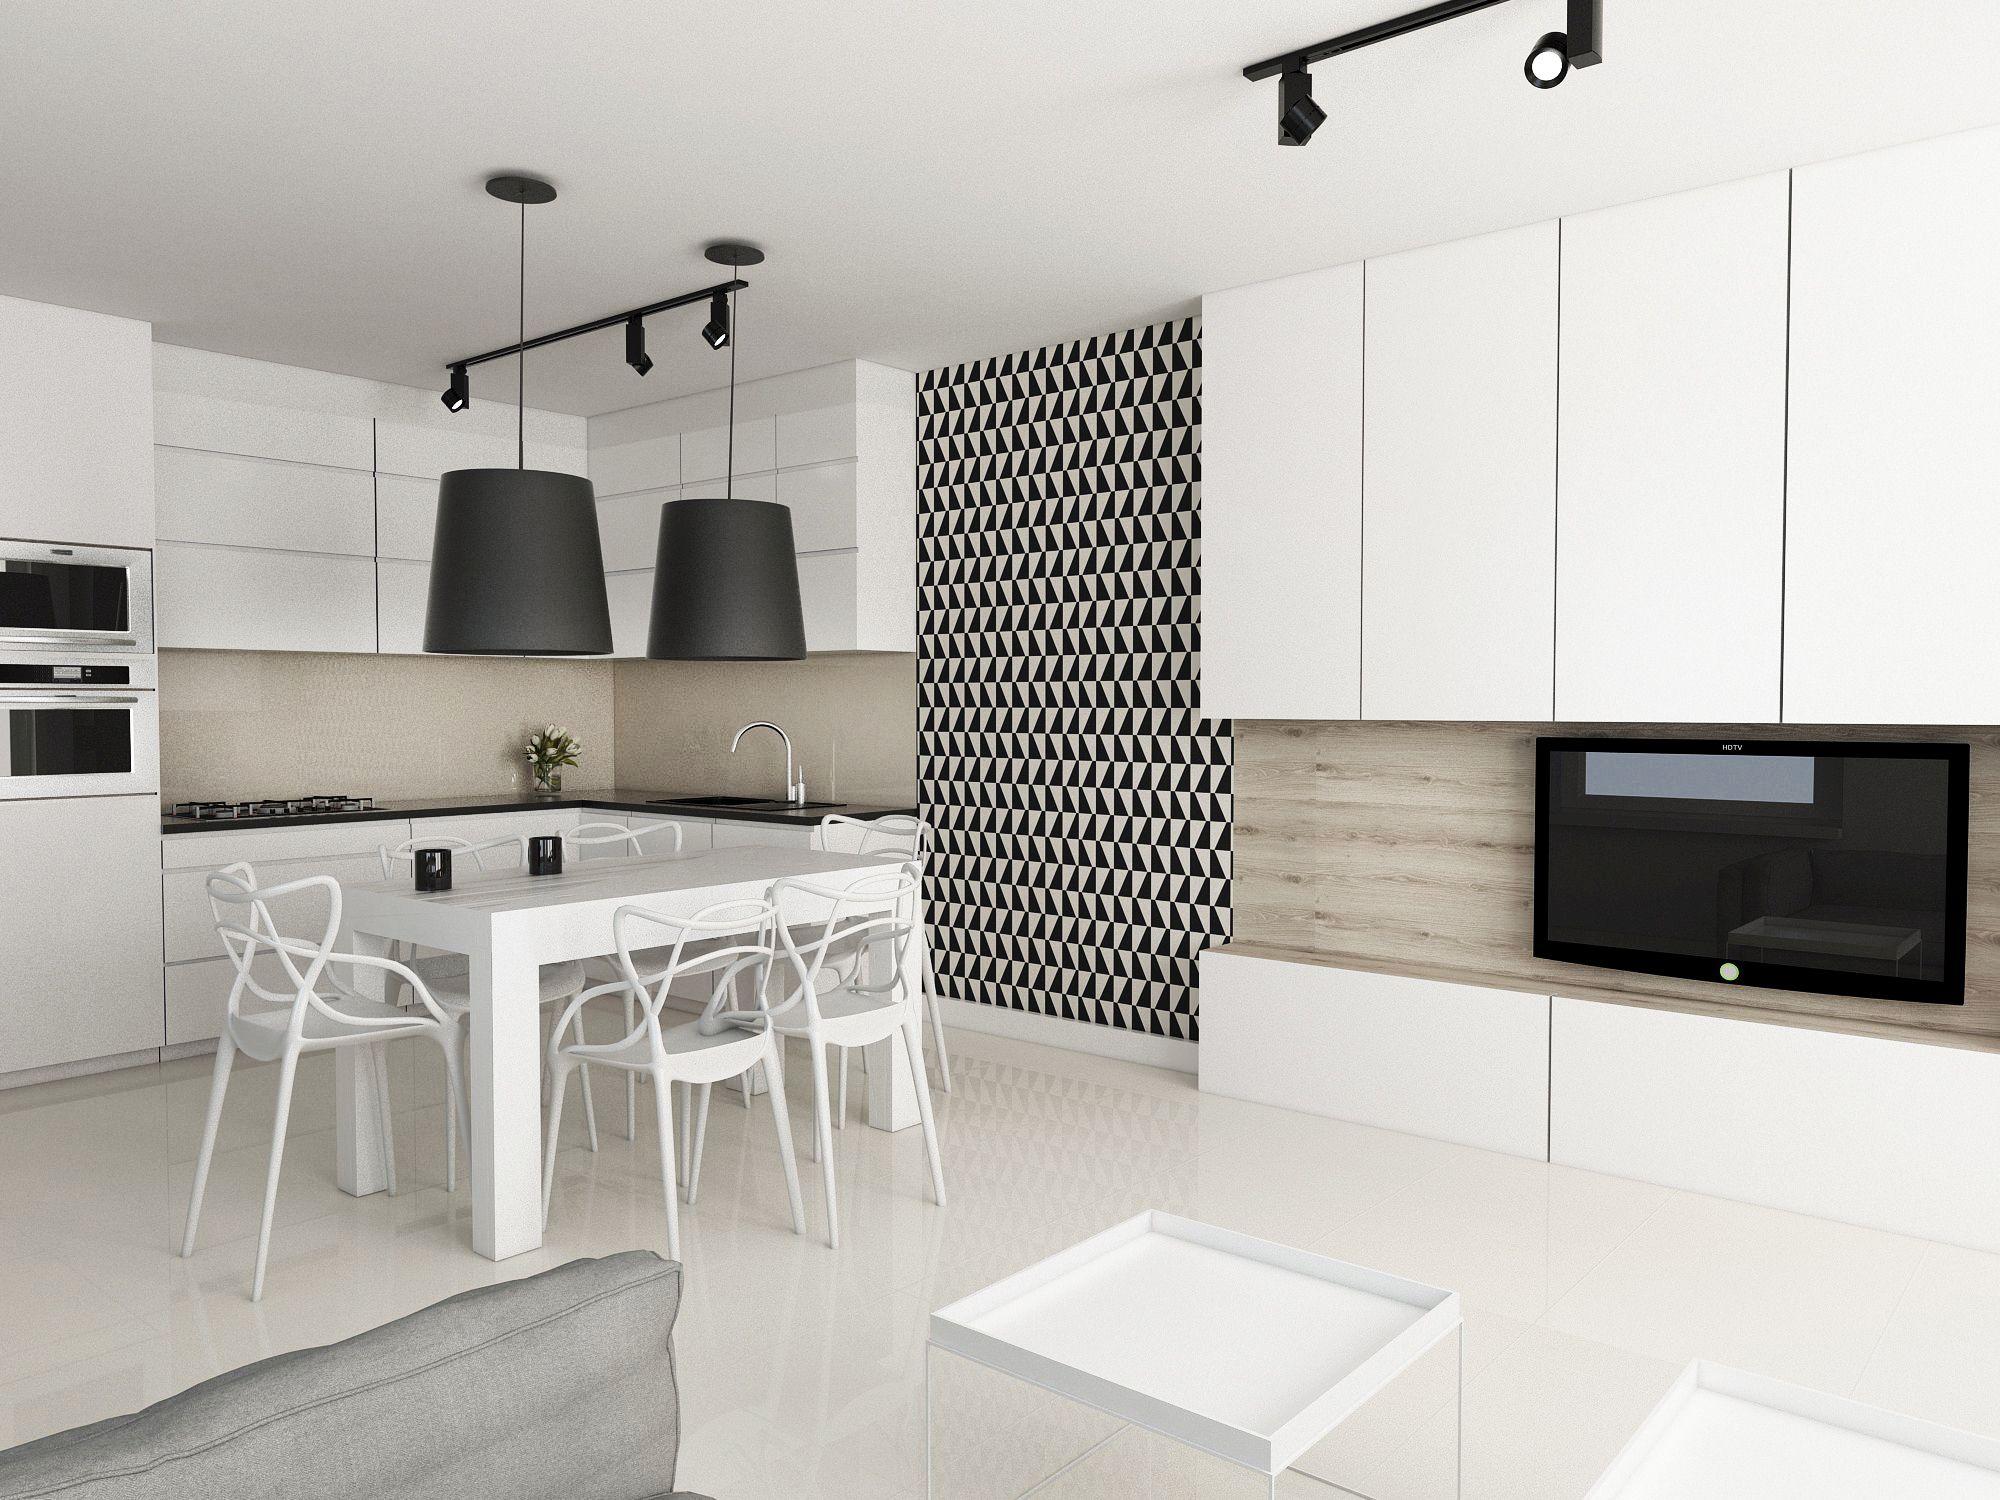 Tapeta W Kuchni ściany I Podłogi Kuchennycompl